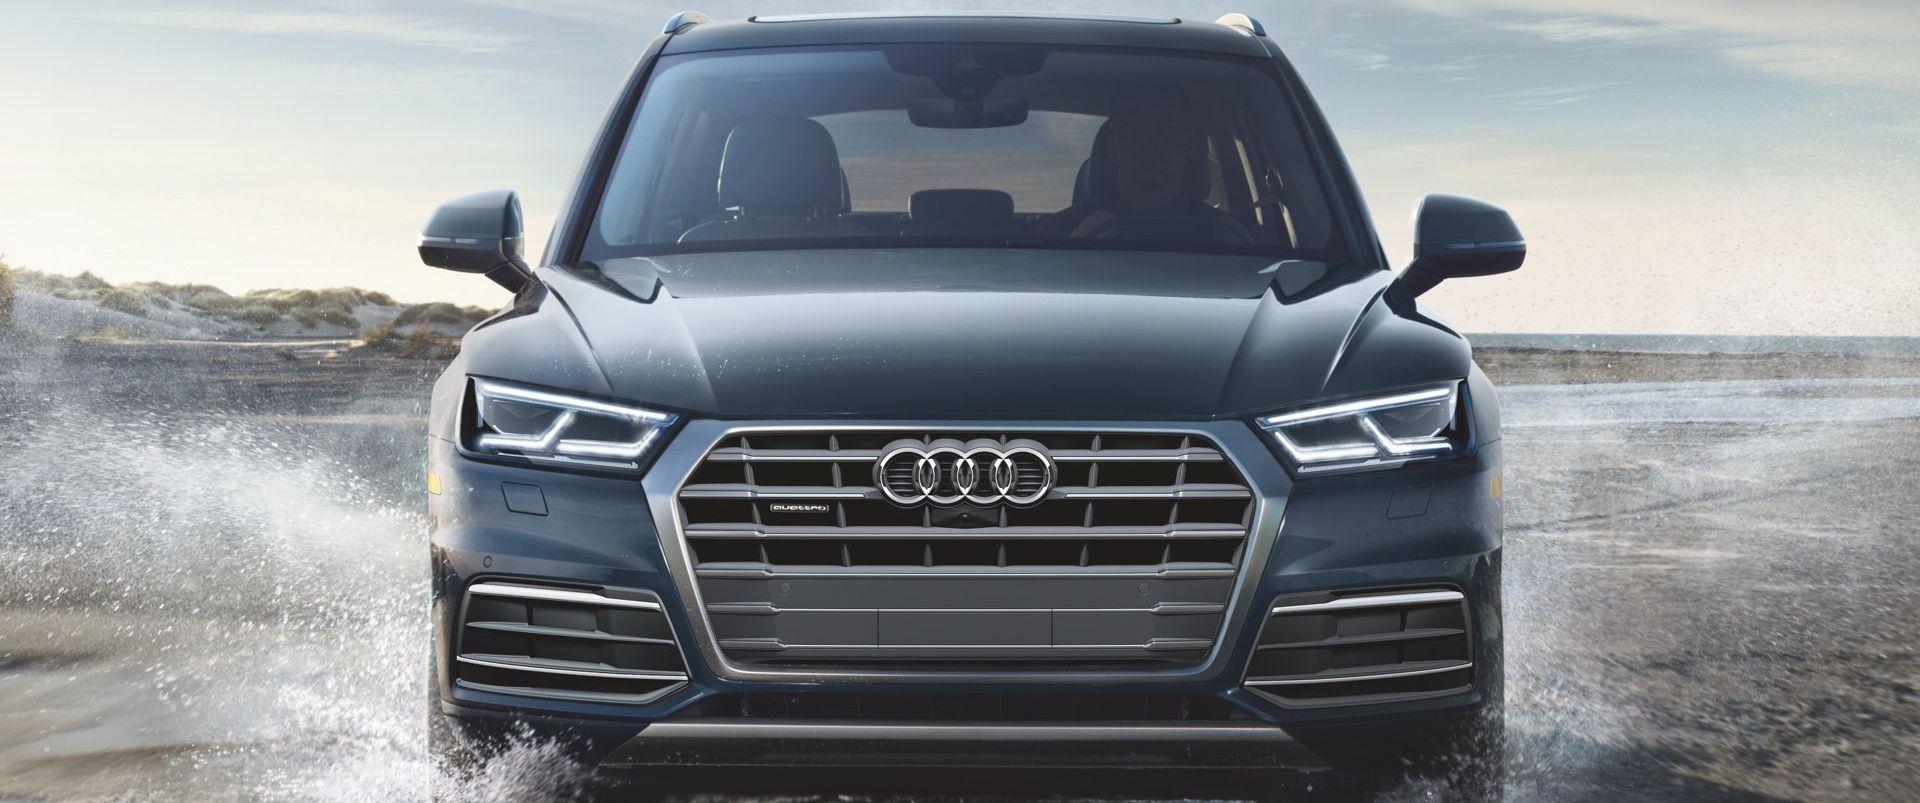 Audi Q Financing In Austin TX RollsRoyce Motor Cars Austin - Austin audi